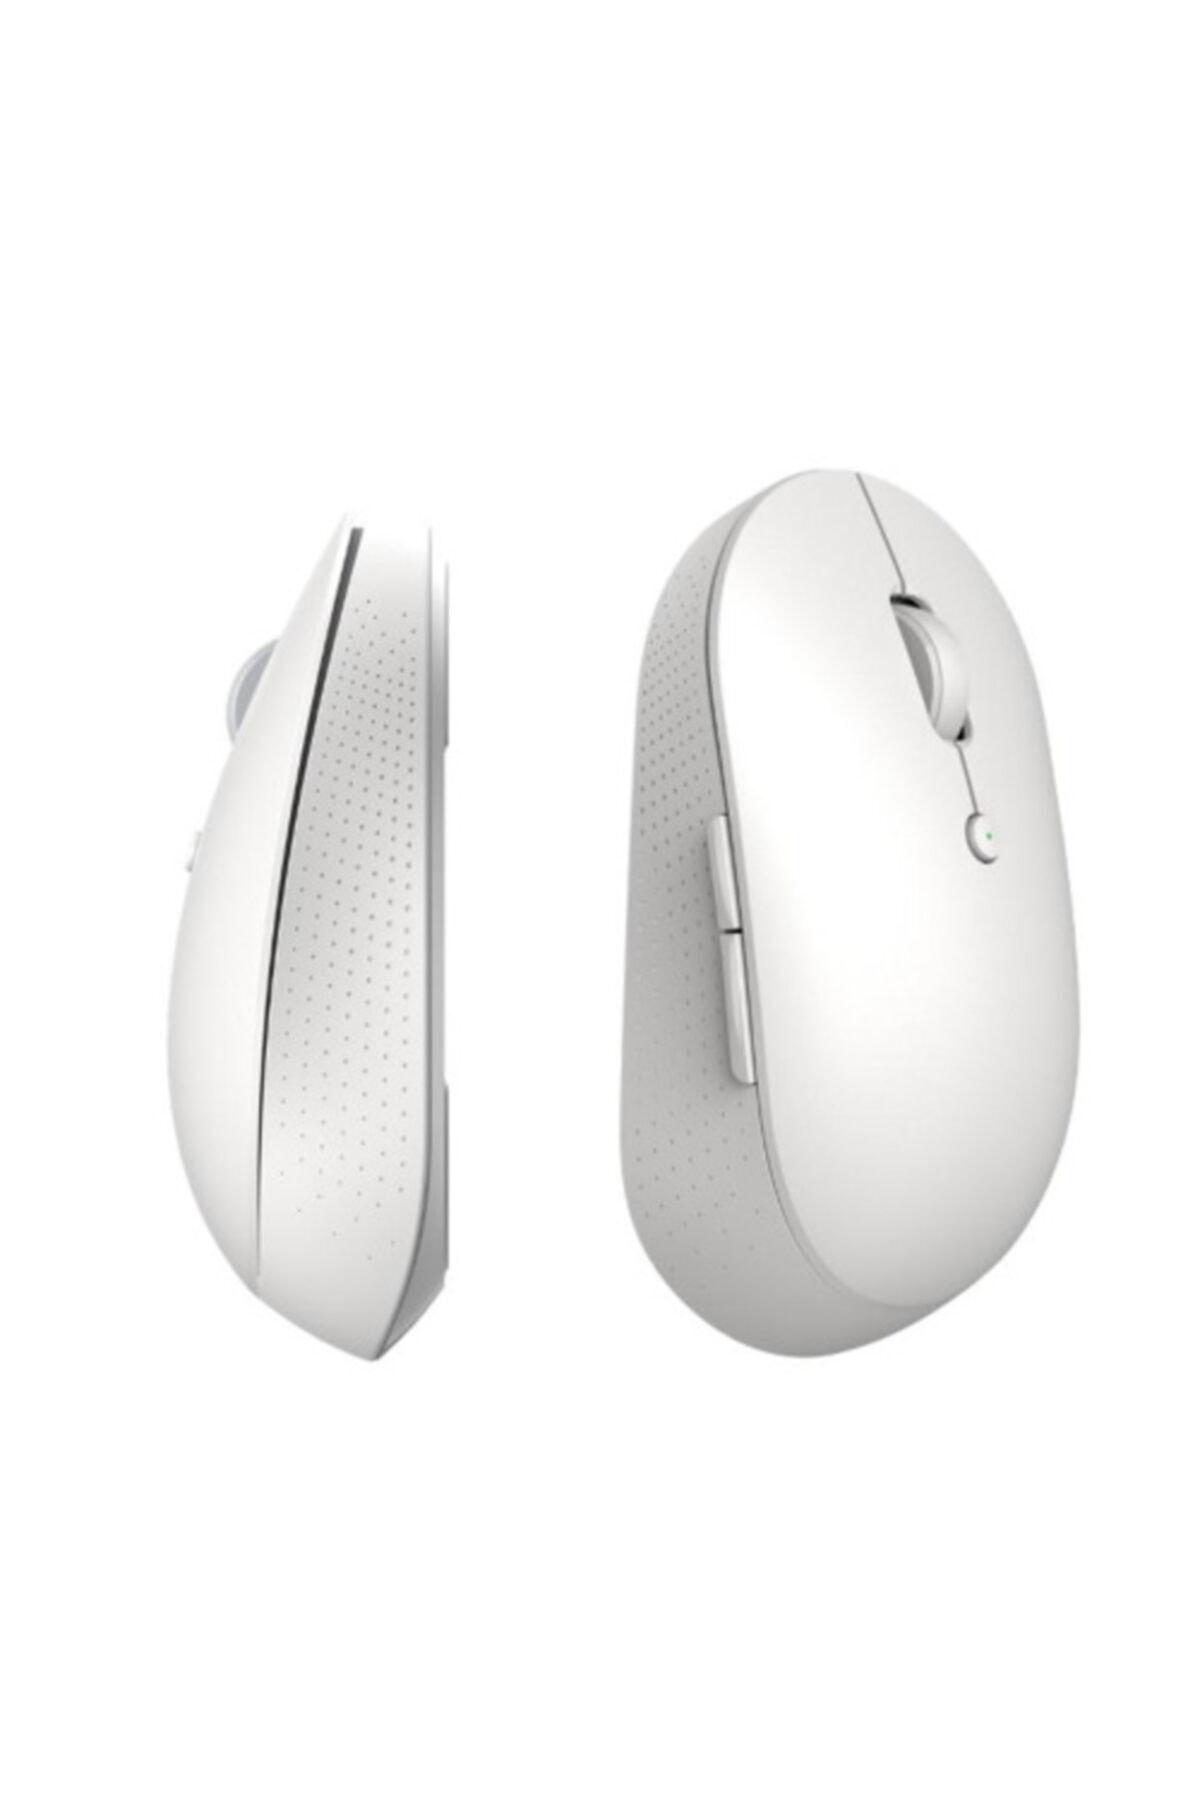 Xiaomi Mi Çift Modlu Kablosuz Bluetooth Mouse (beyaz) 1